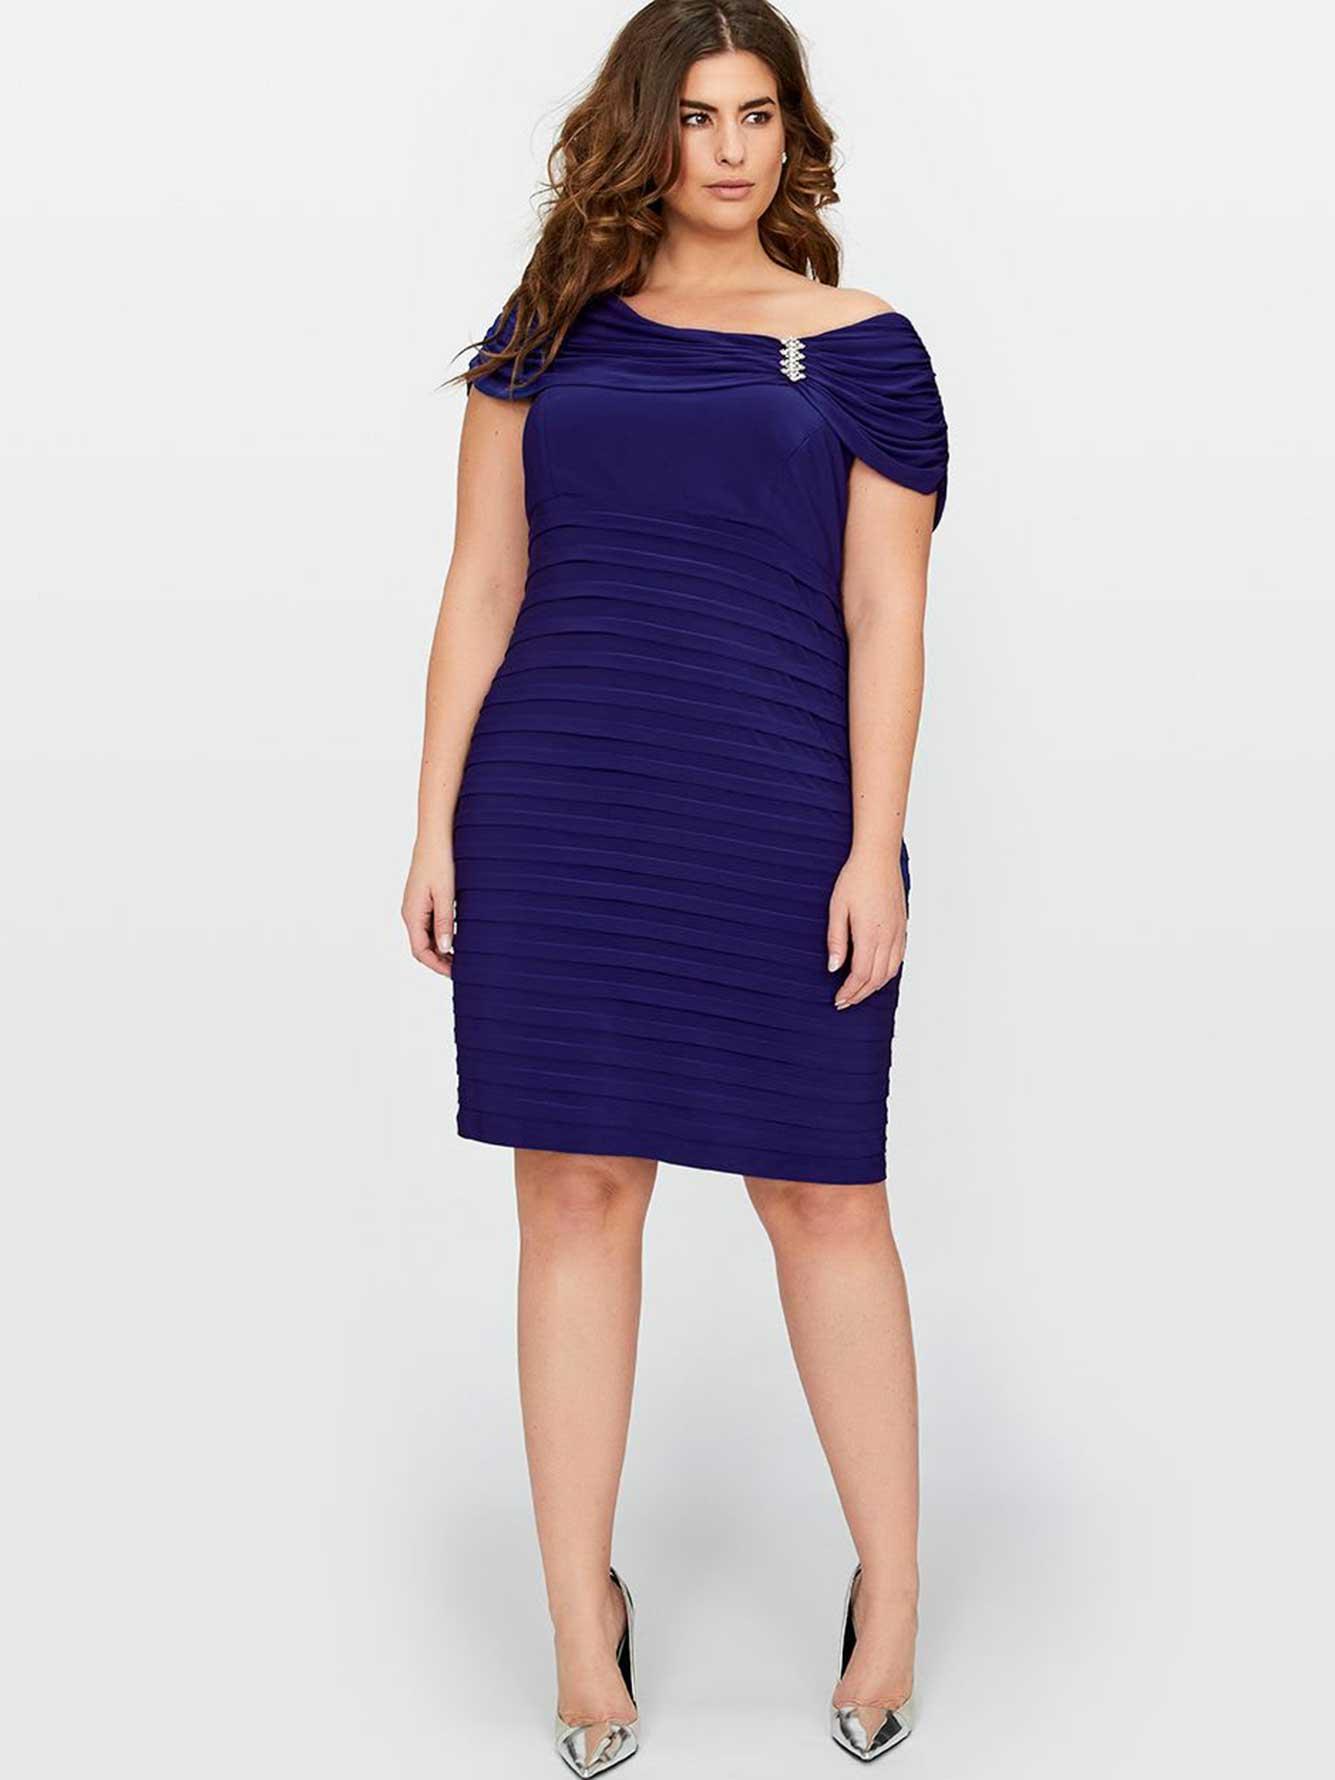 Short Shutter Pleat Dress With Broach | Addition Elle